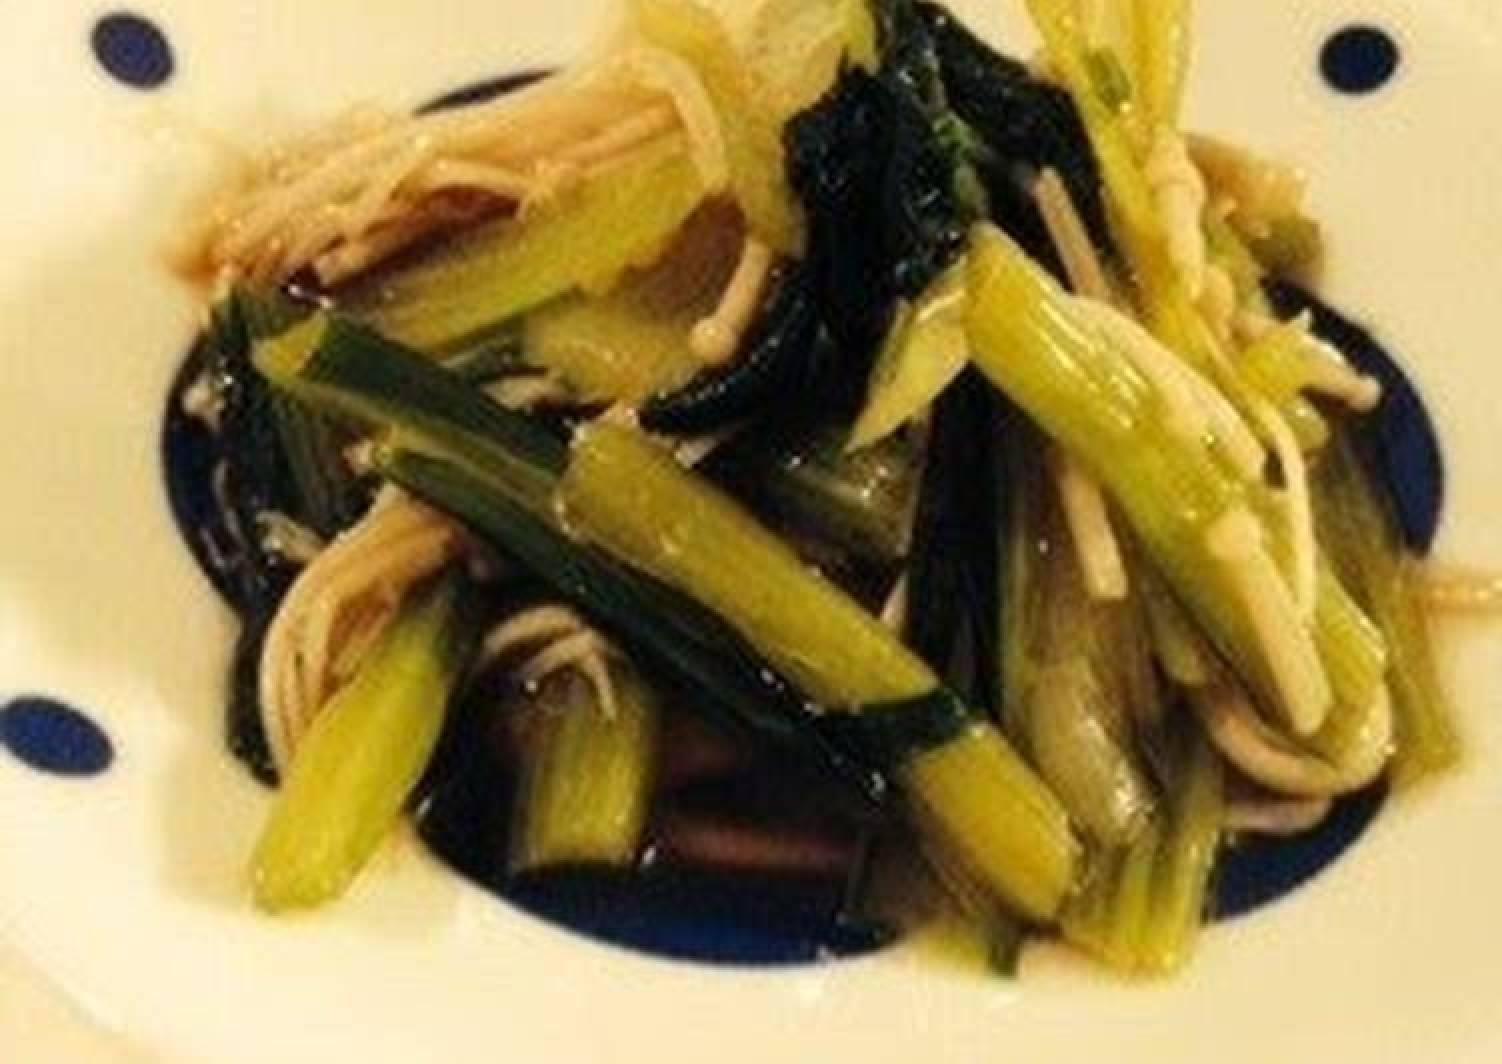 Just 5 Minutes! Seasoned and Blanched Komatsuna Greens & Enoki Mushrooms